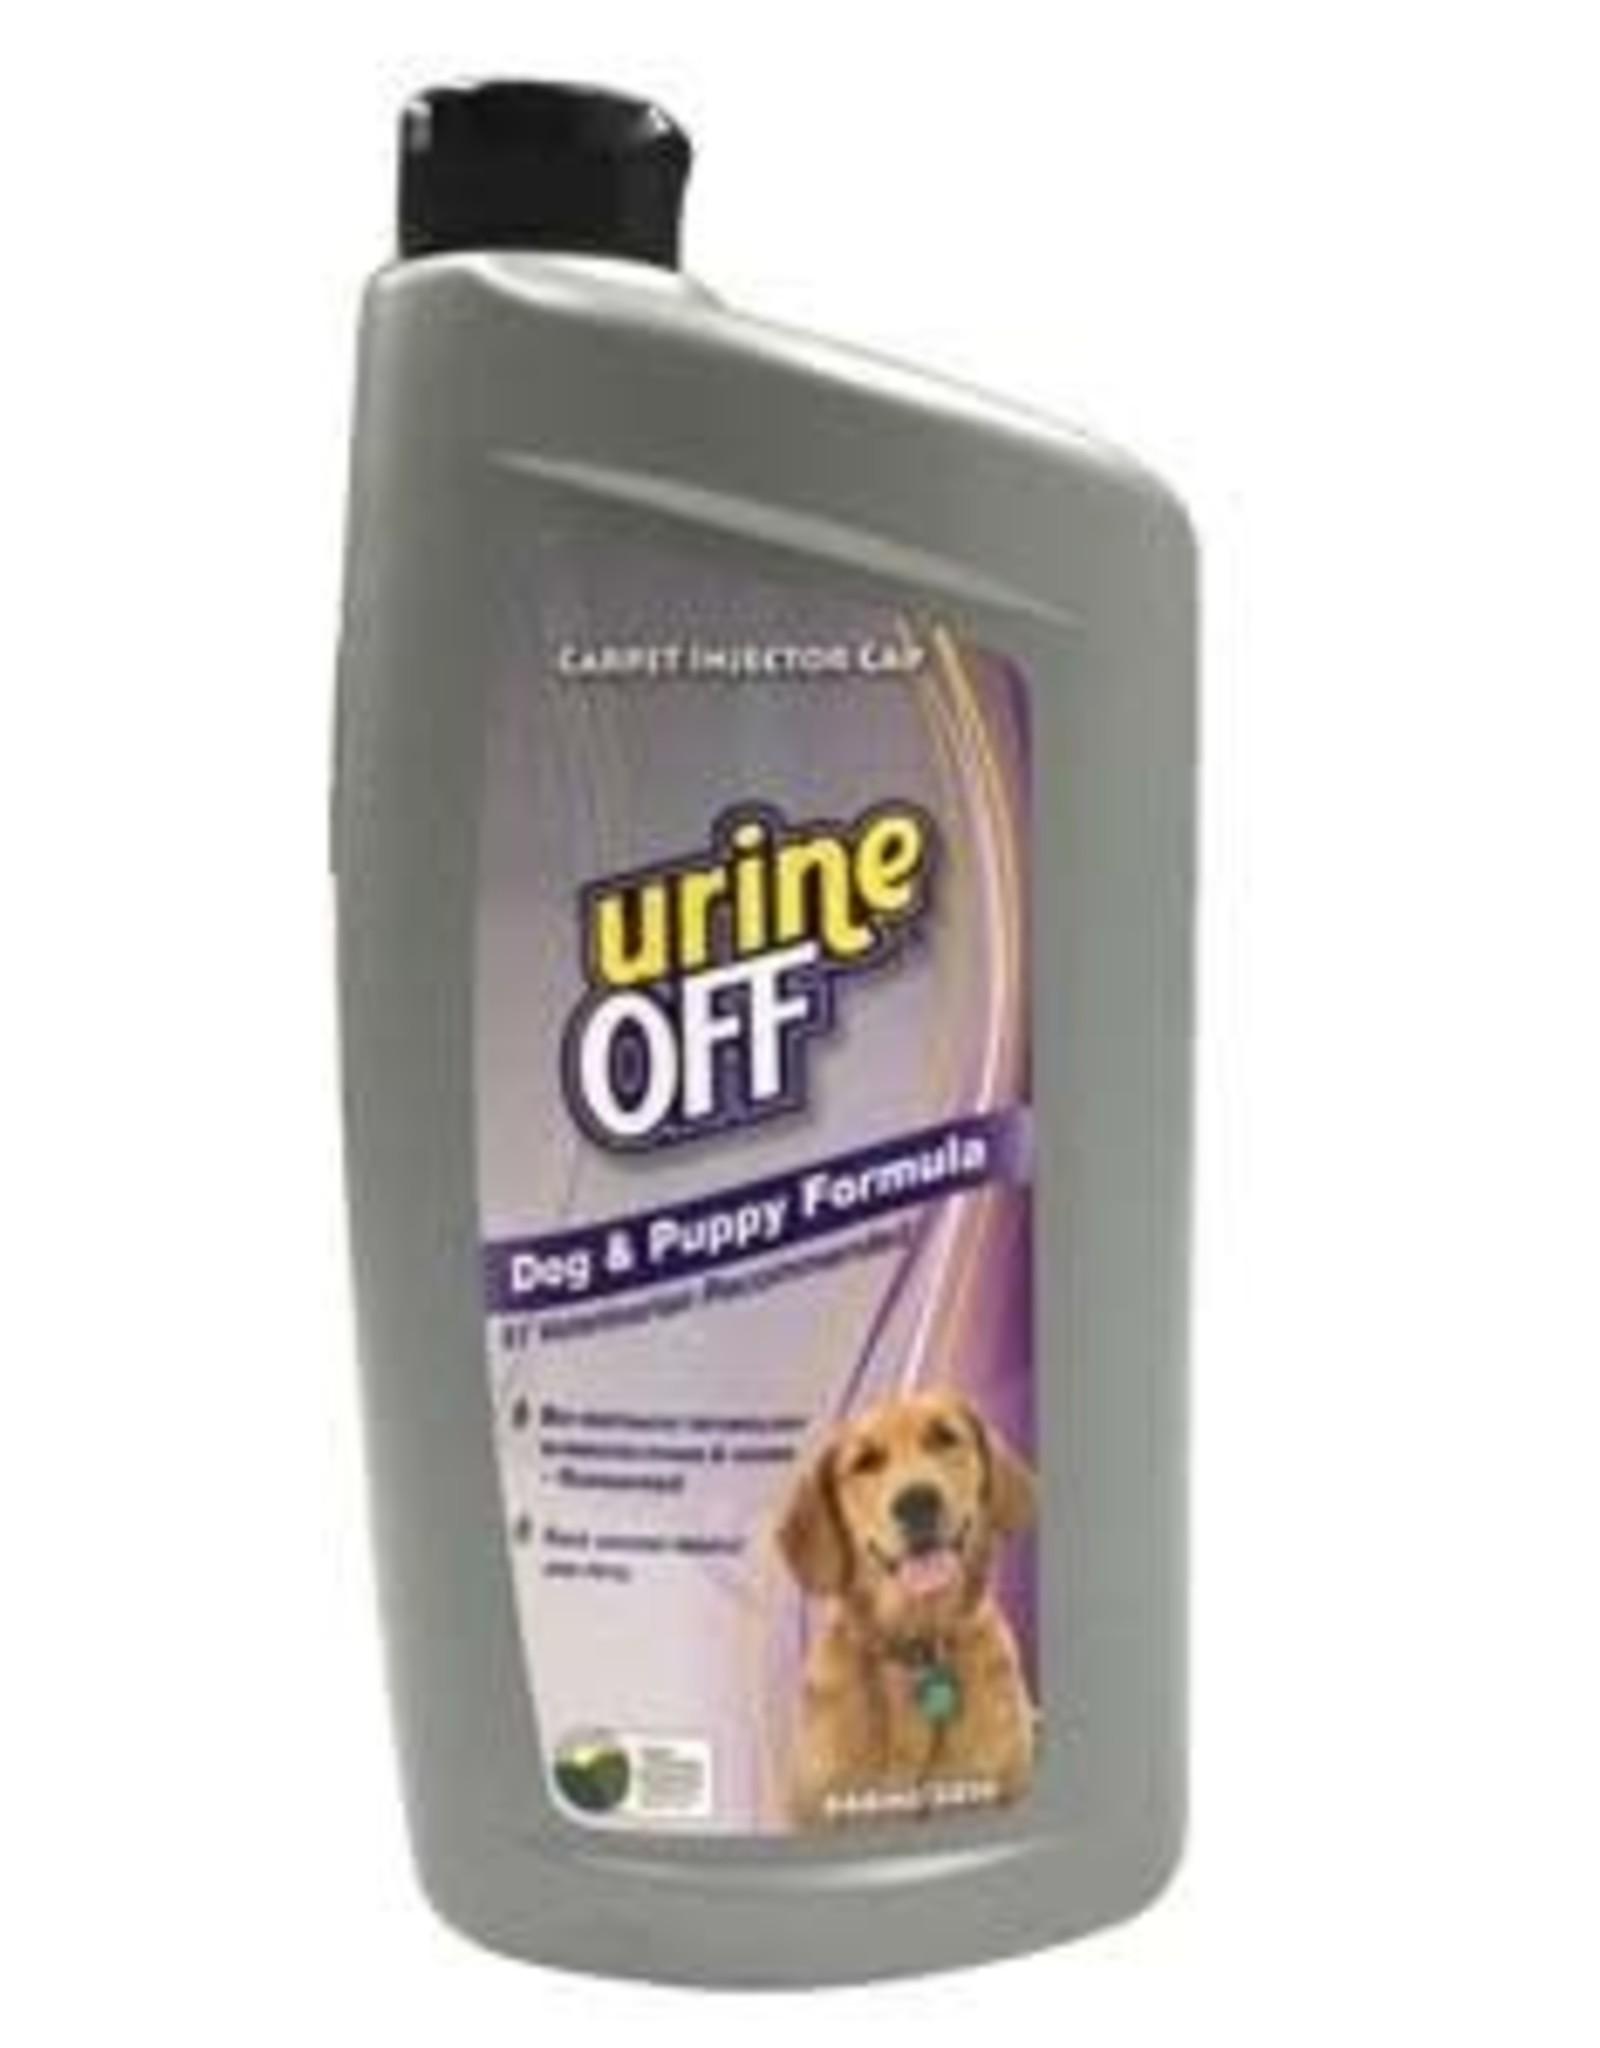 Urine Off Dog Amp Puppy Formula